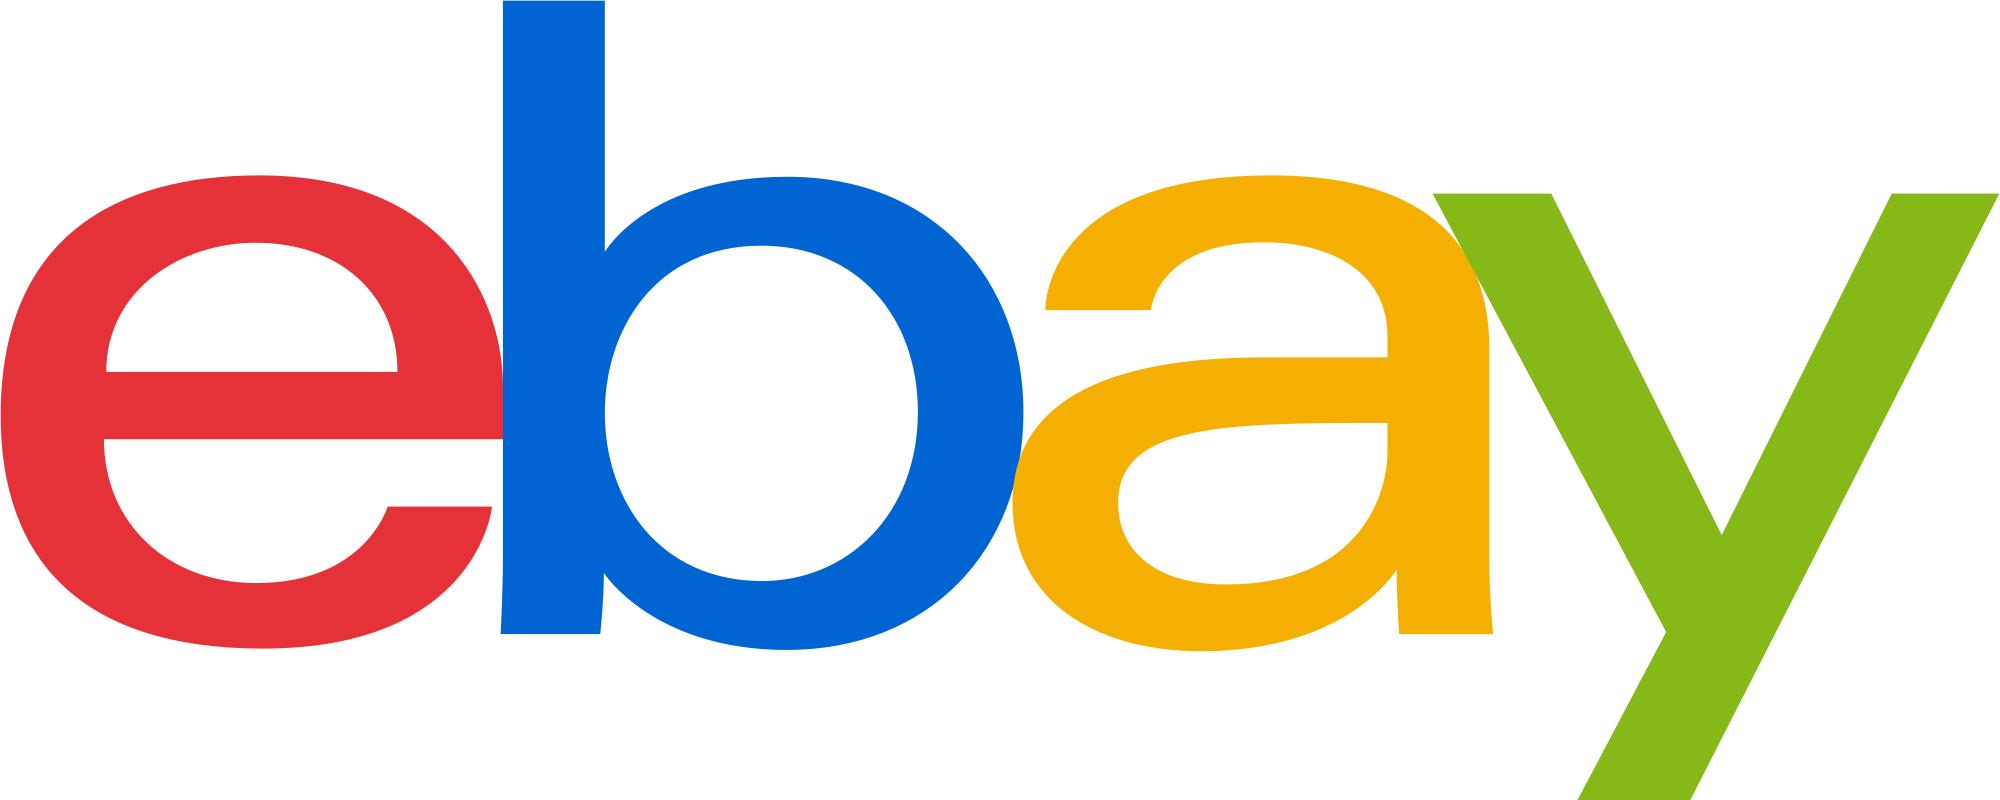 Random bonus Nector pts on purchases from 18th-23rd April @ Ebay